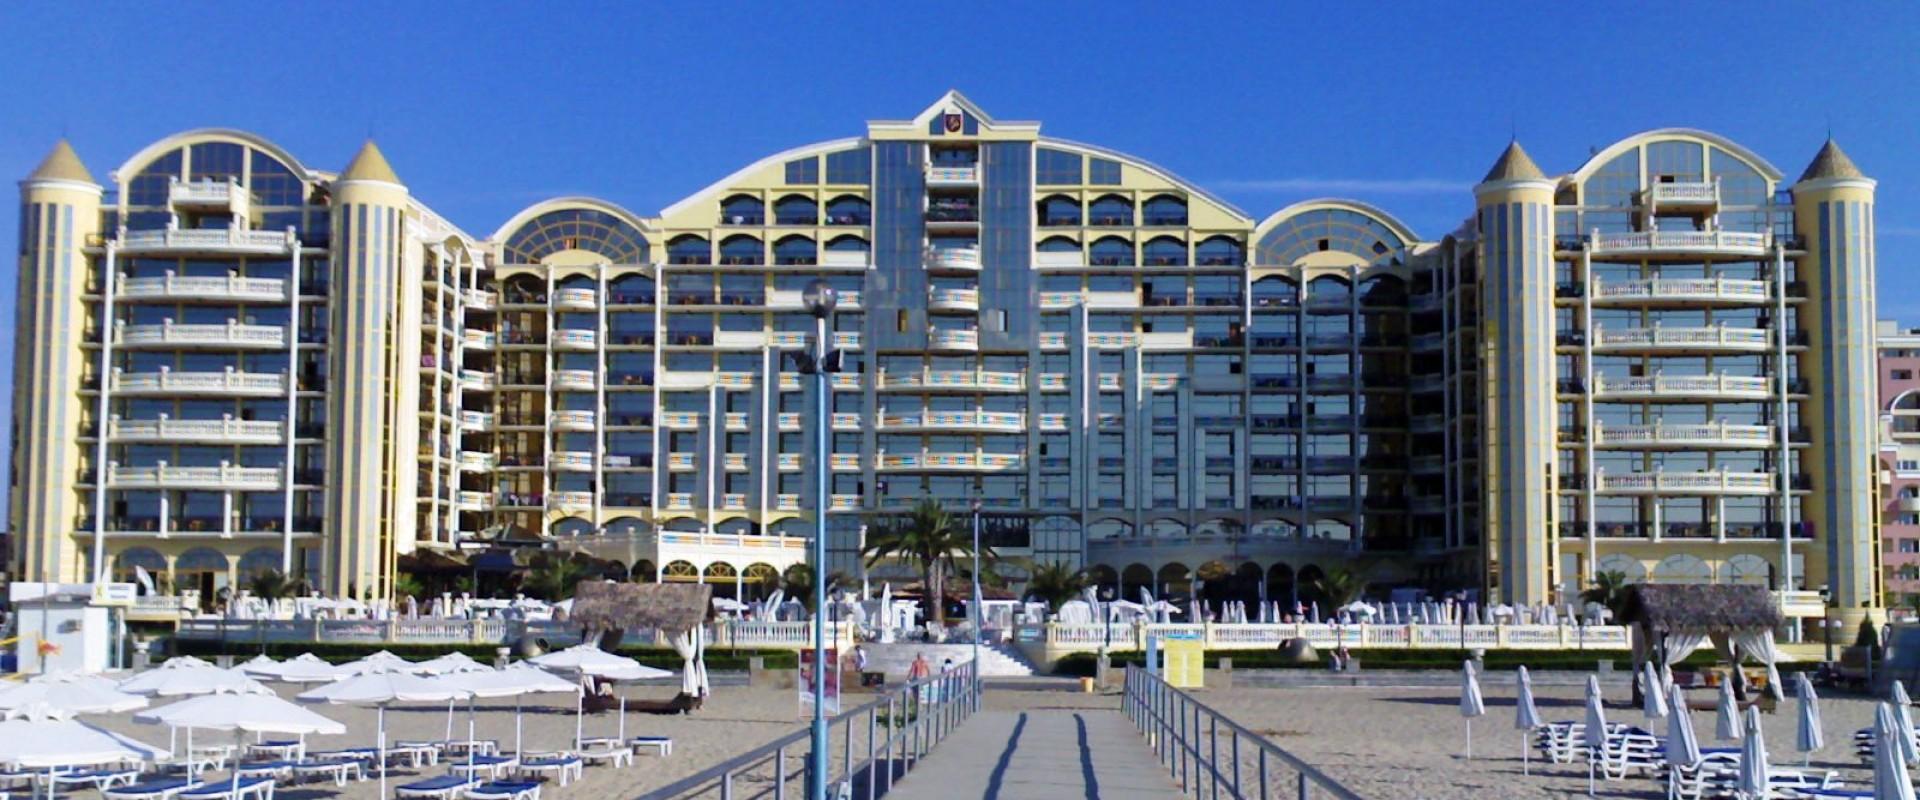 Vacanță în Bulgaria 2021, Sunny Beach, Hotel Imperial Palace